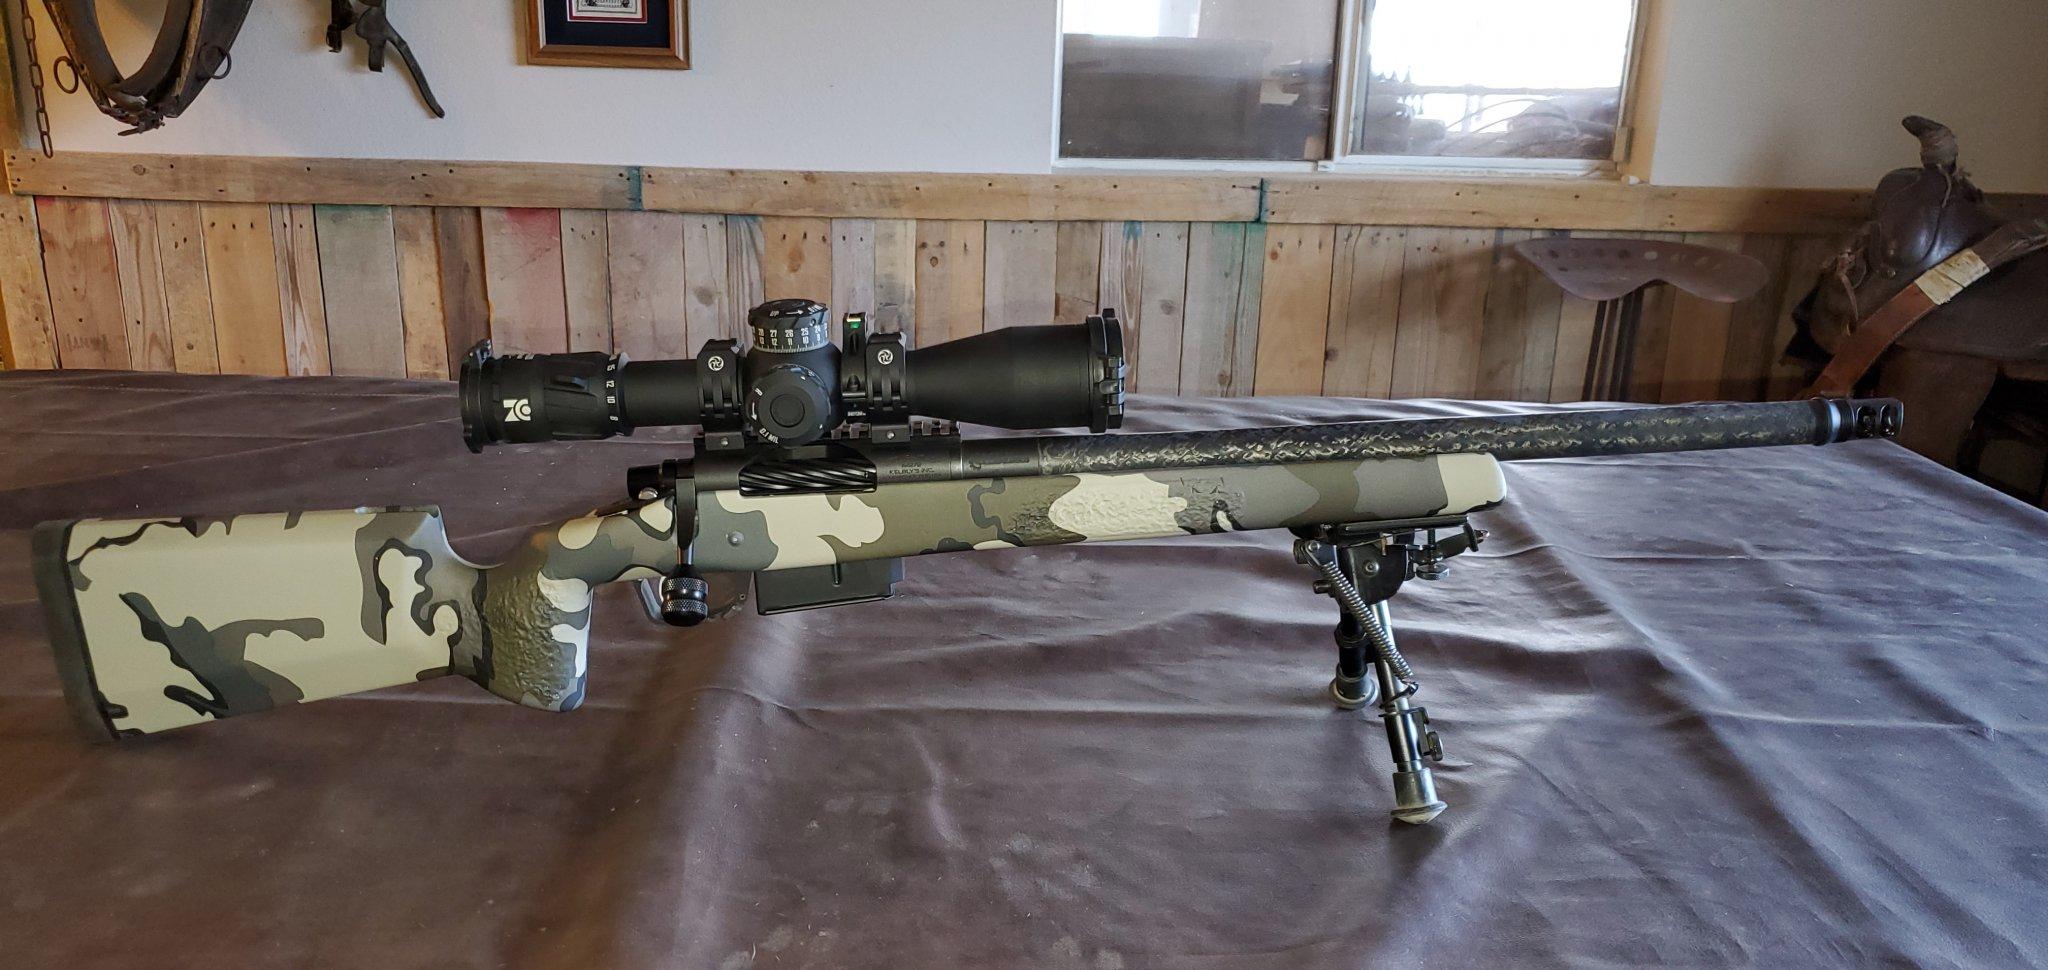 https://www.snipershide.com/shooting/attachments/20200319_144849-jpg.7277228/